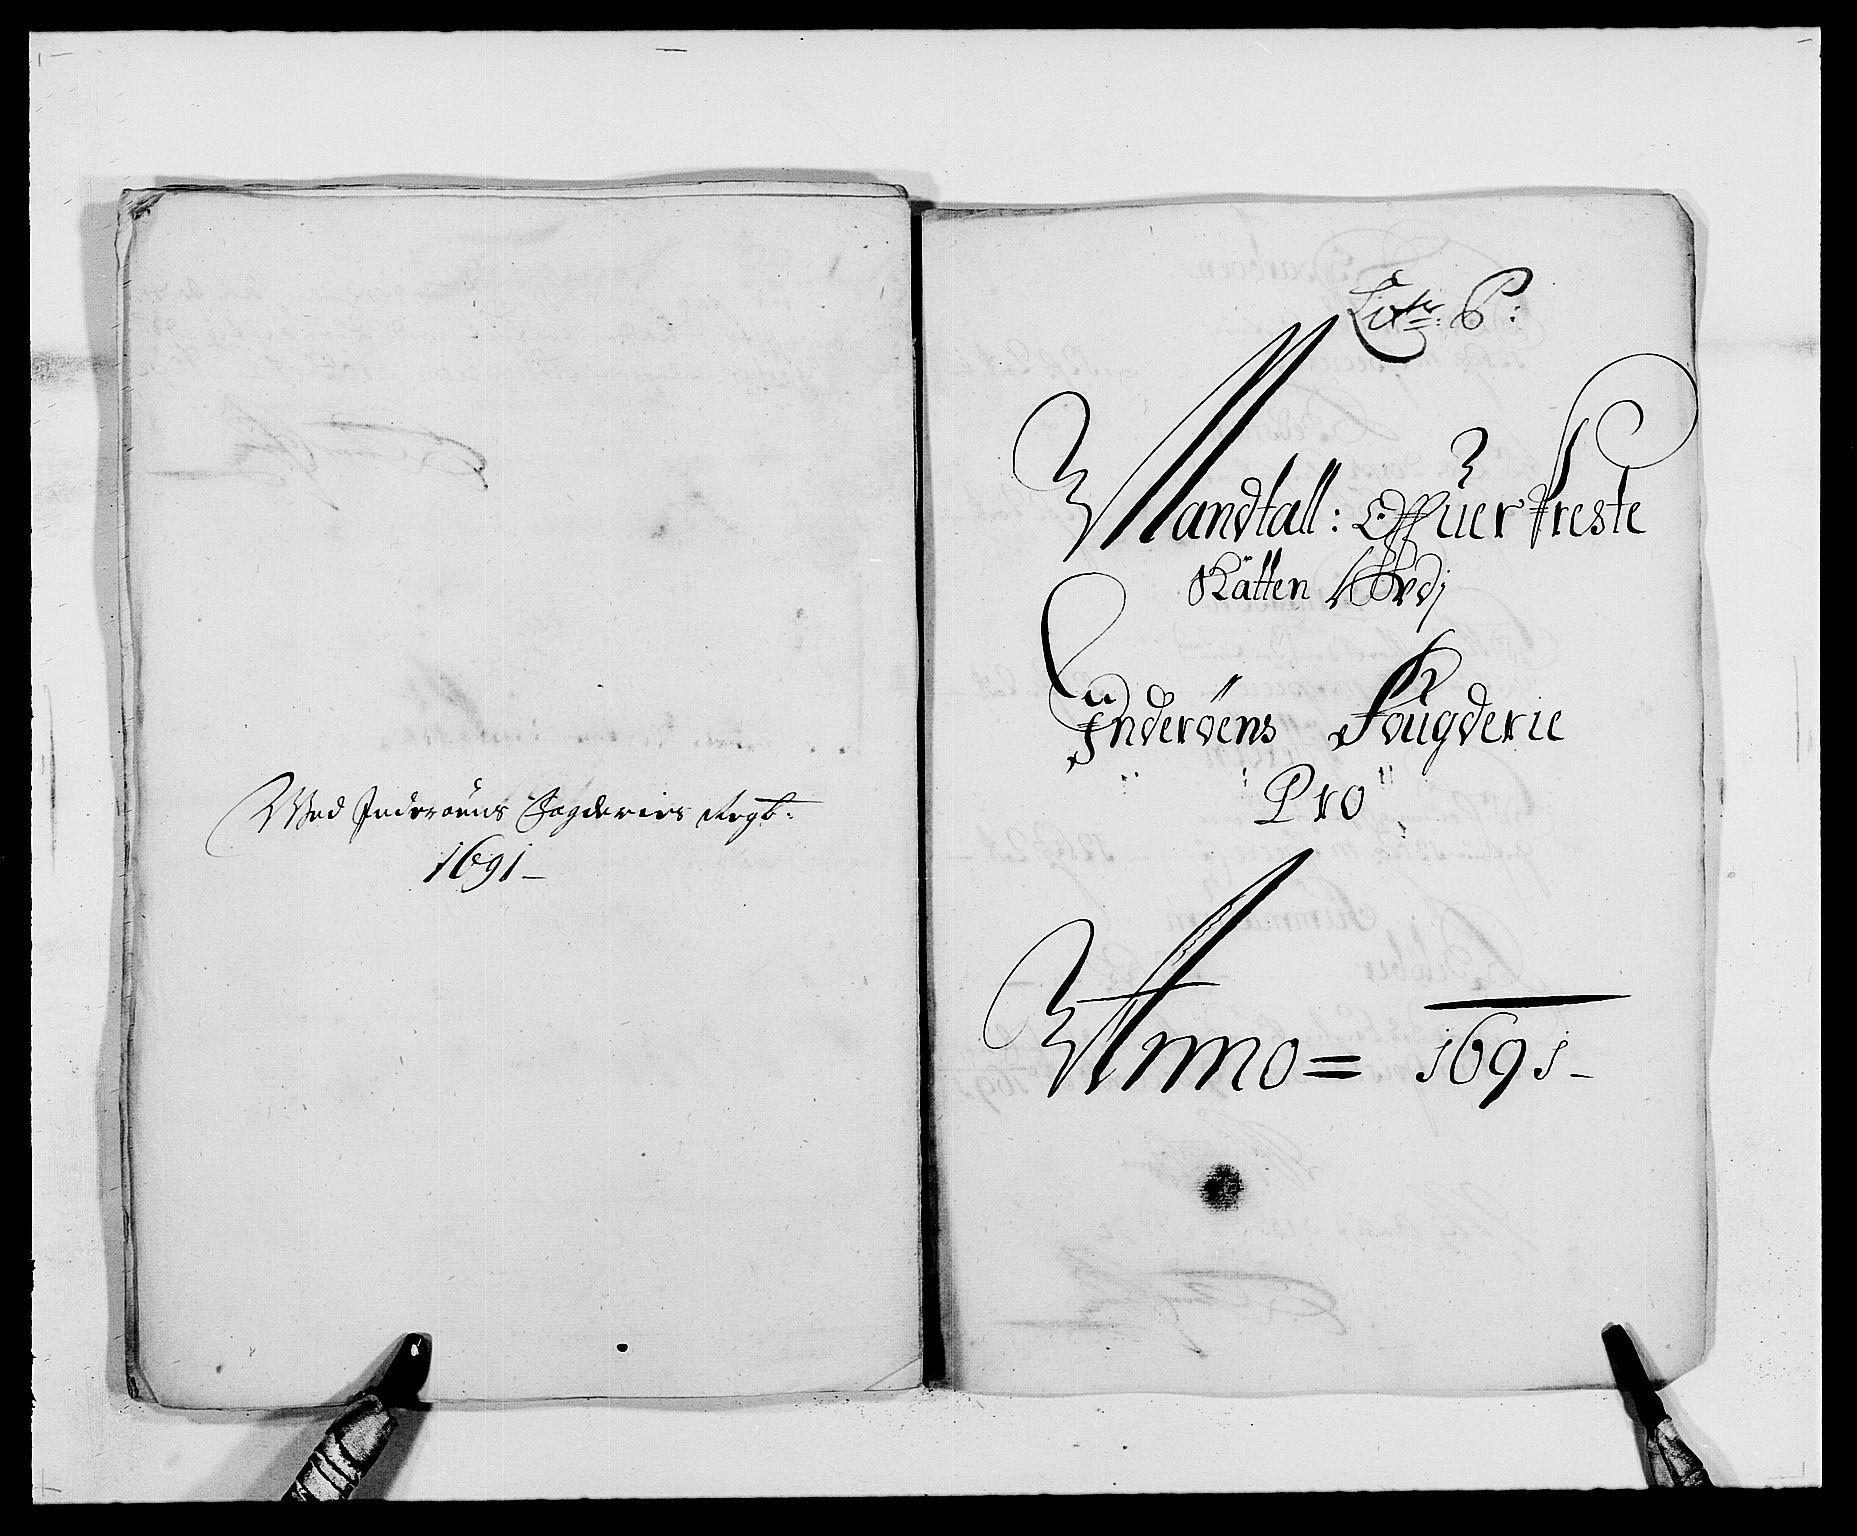 RA, Rentekammeret inntil 1814, Reviderte regnskaper, Fogderegnskap, R63/L4307: Fogderegnskap Inderøy, 1690-1691, s. 408